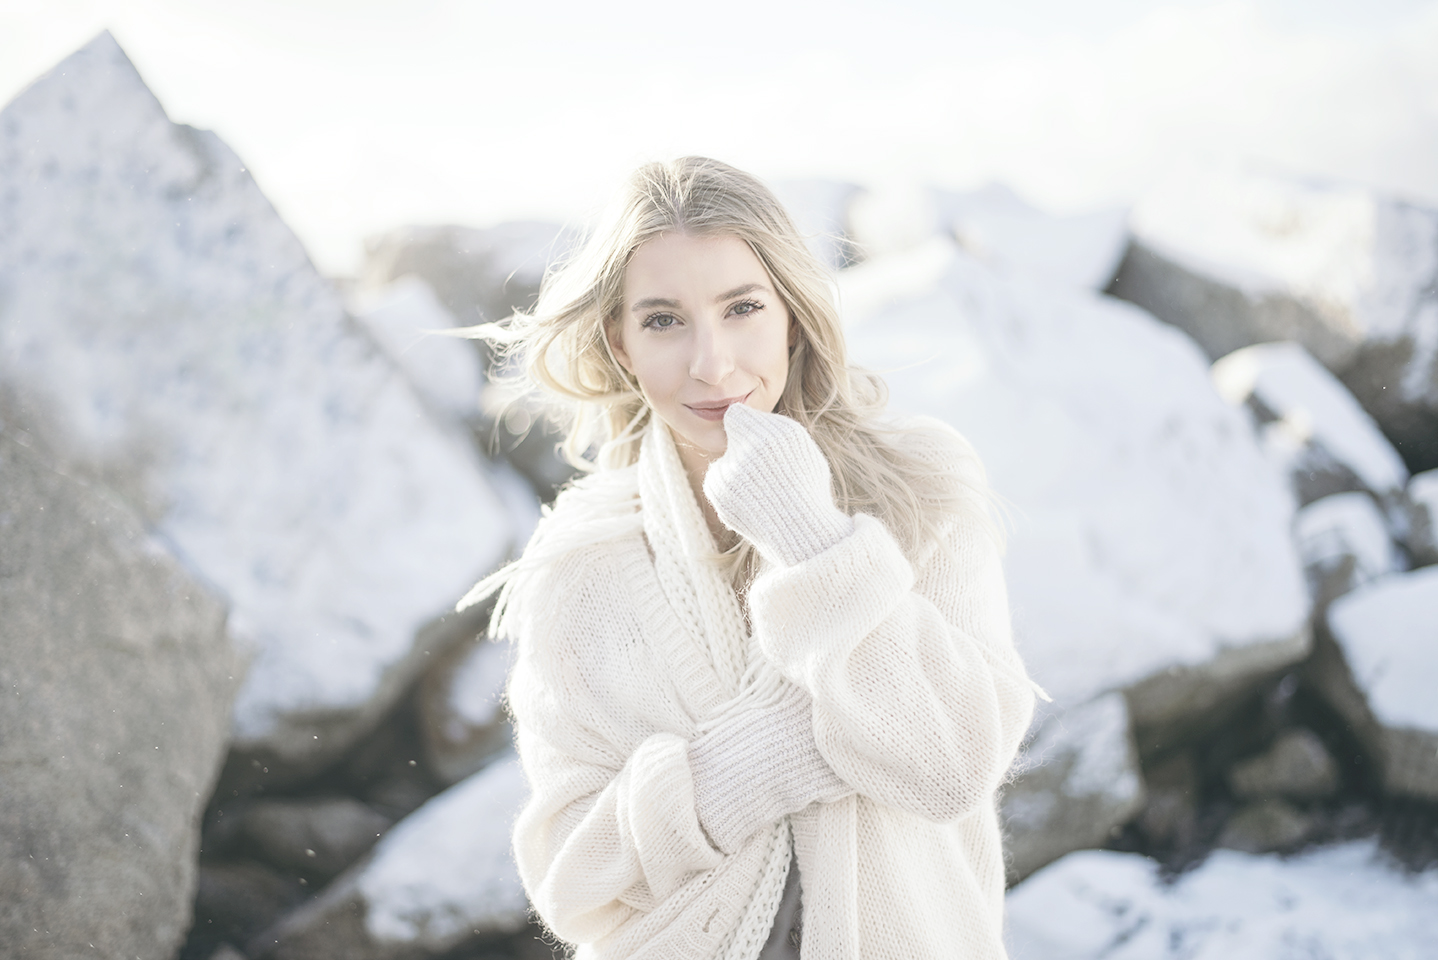 sea_side_snow_4